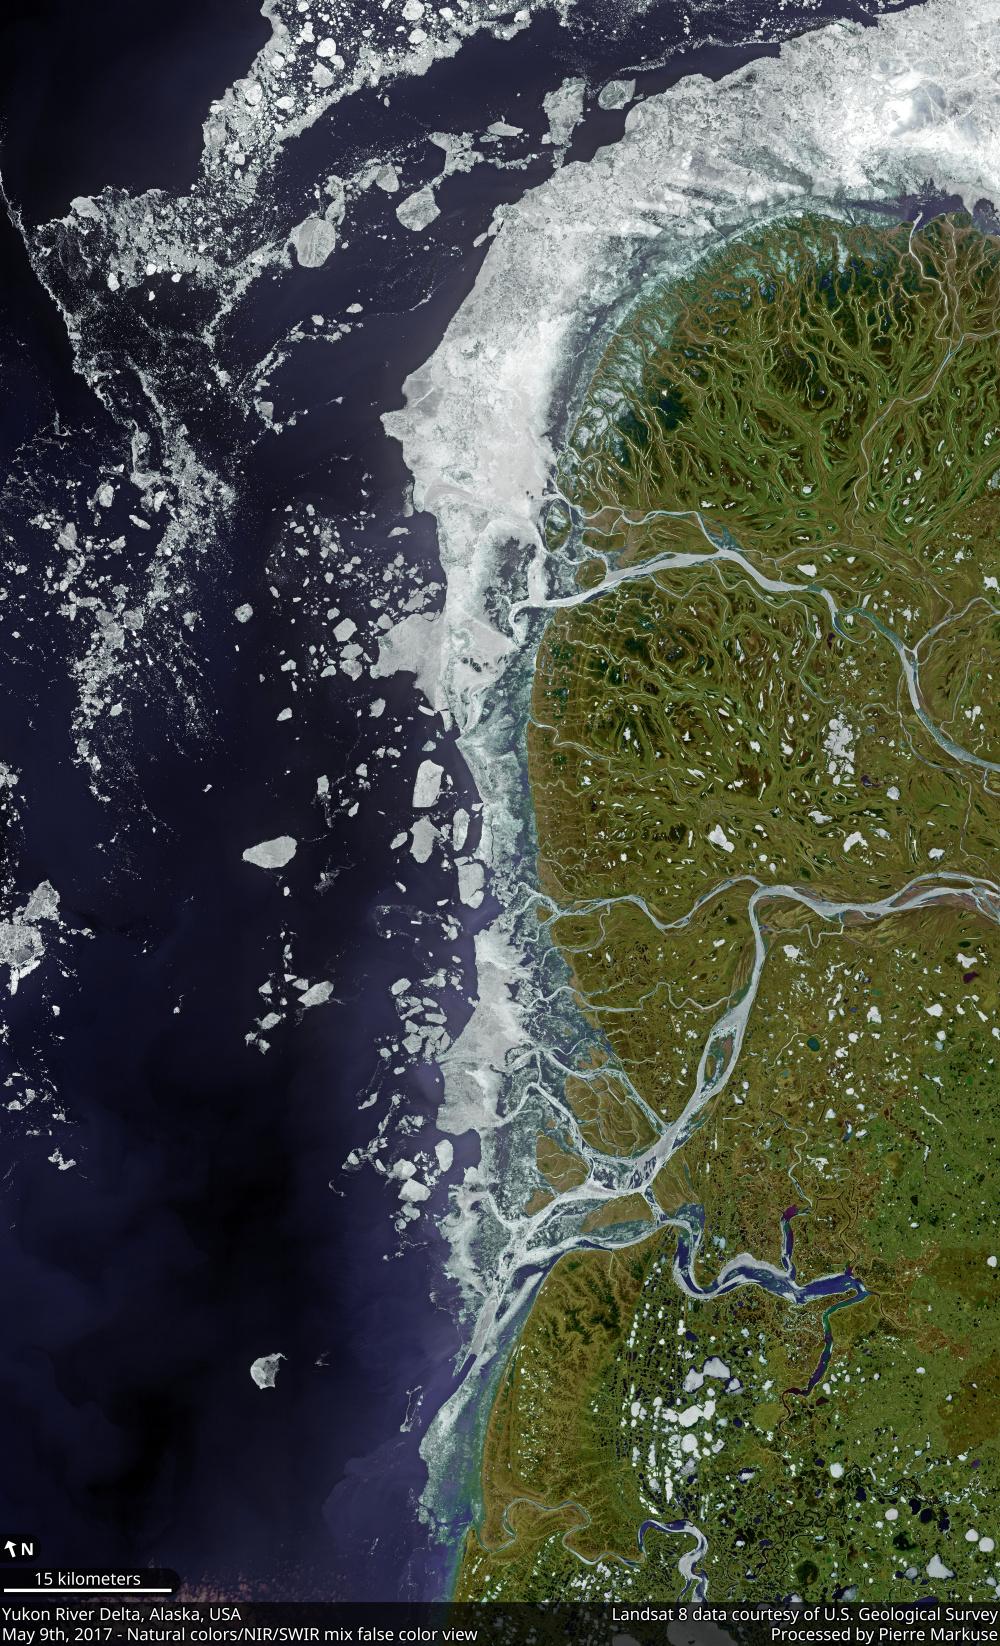 Yukon River delta, Alaska, USA